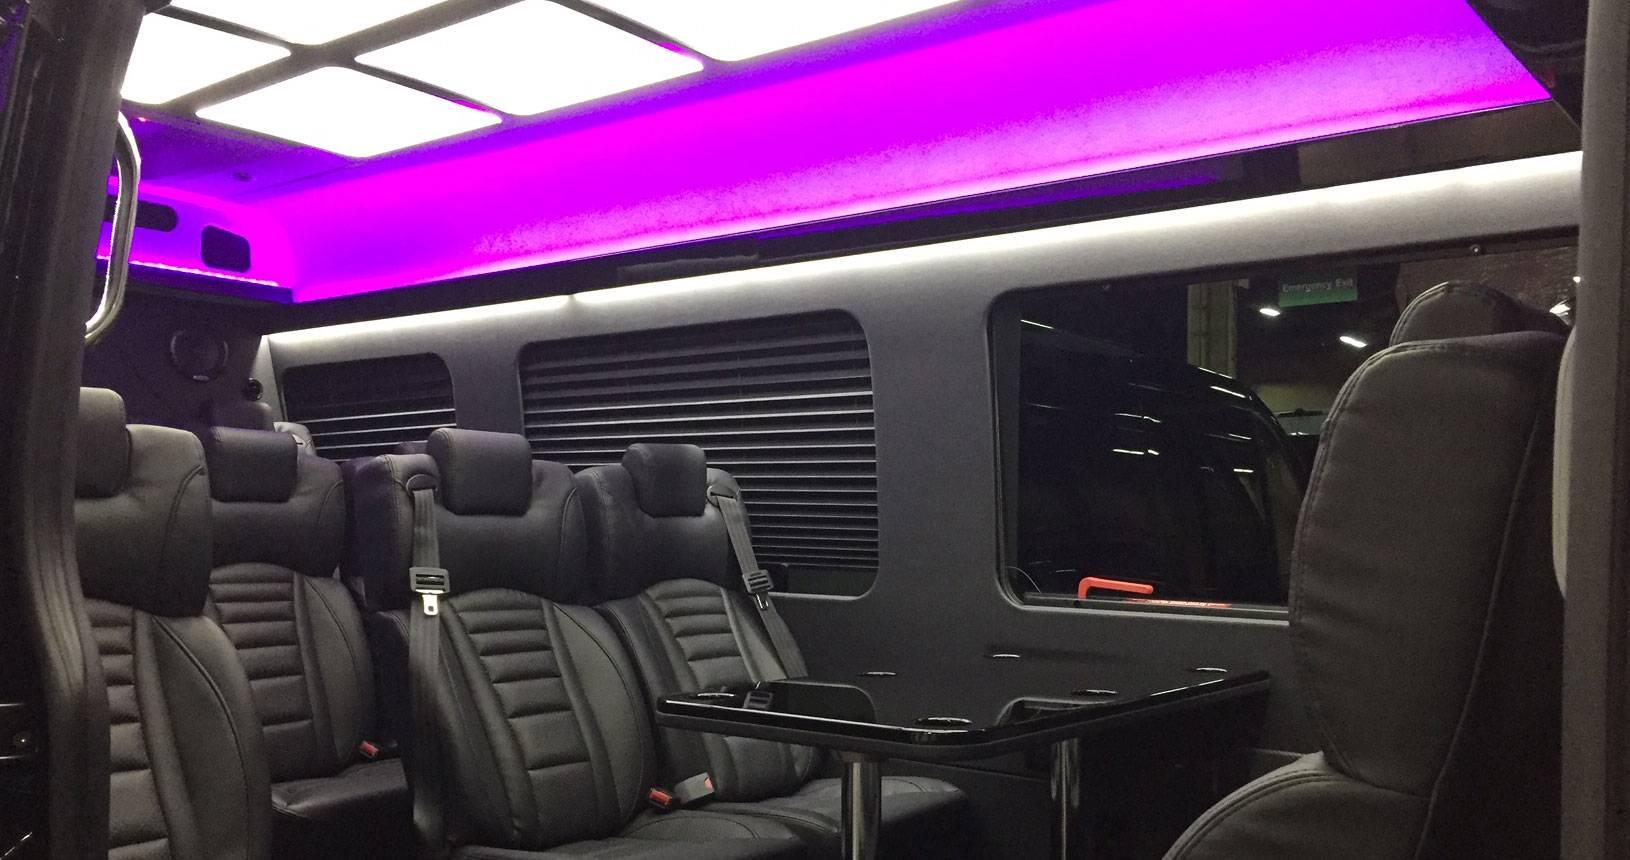 14 passenger mercedes sprinter michael 39 s limousine - Mercedes sprinter interior light ...